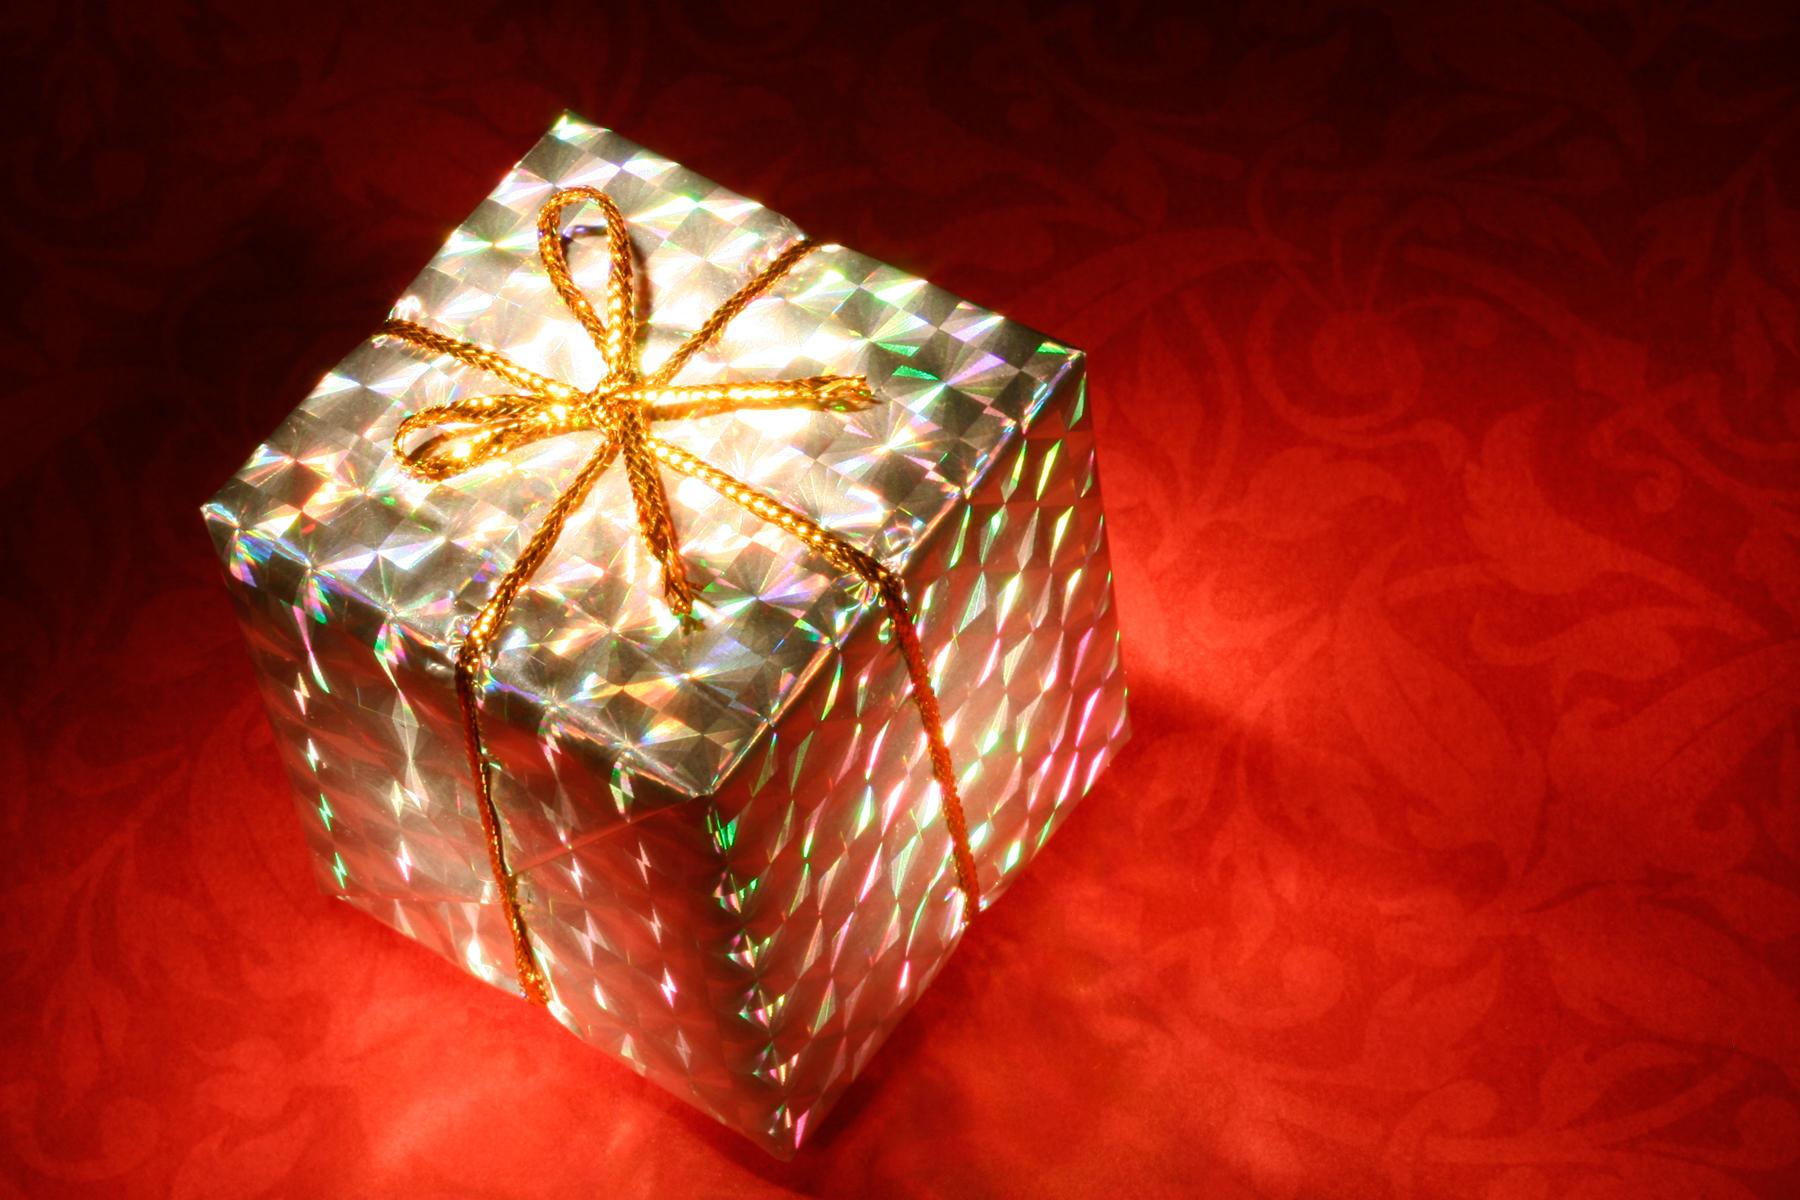 Glowing Gift Box, Black, Resource, Object, Ornament, HQ Photo